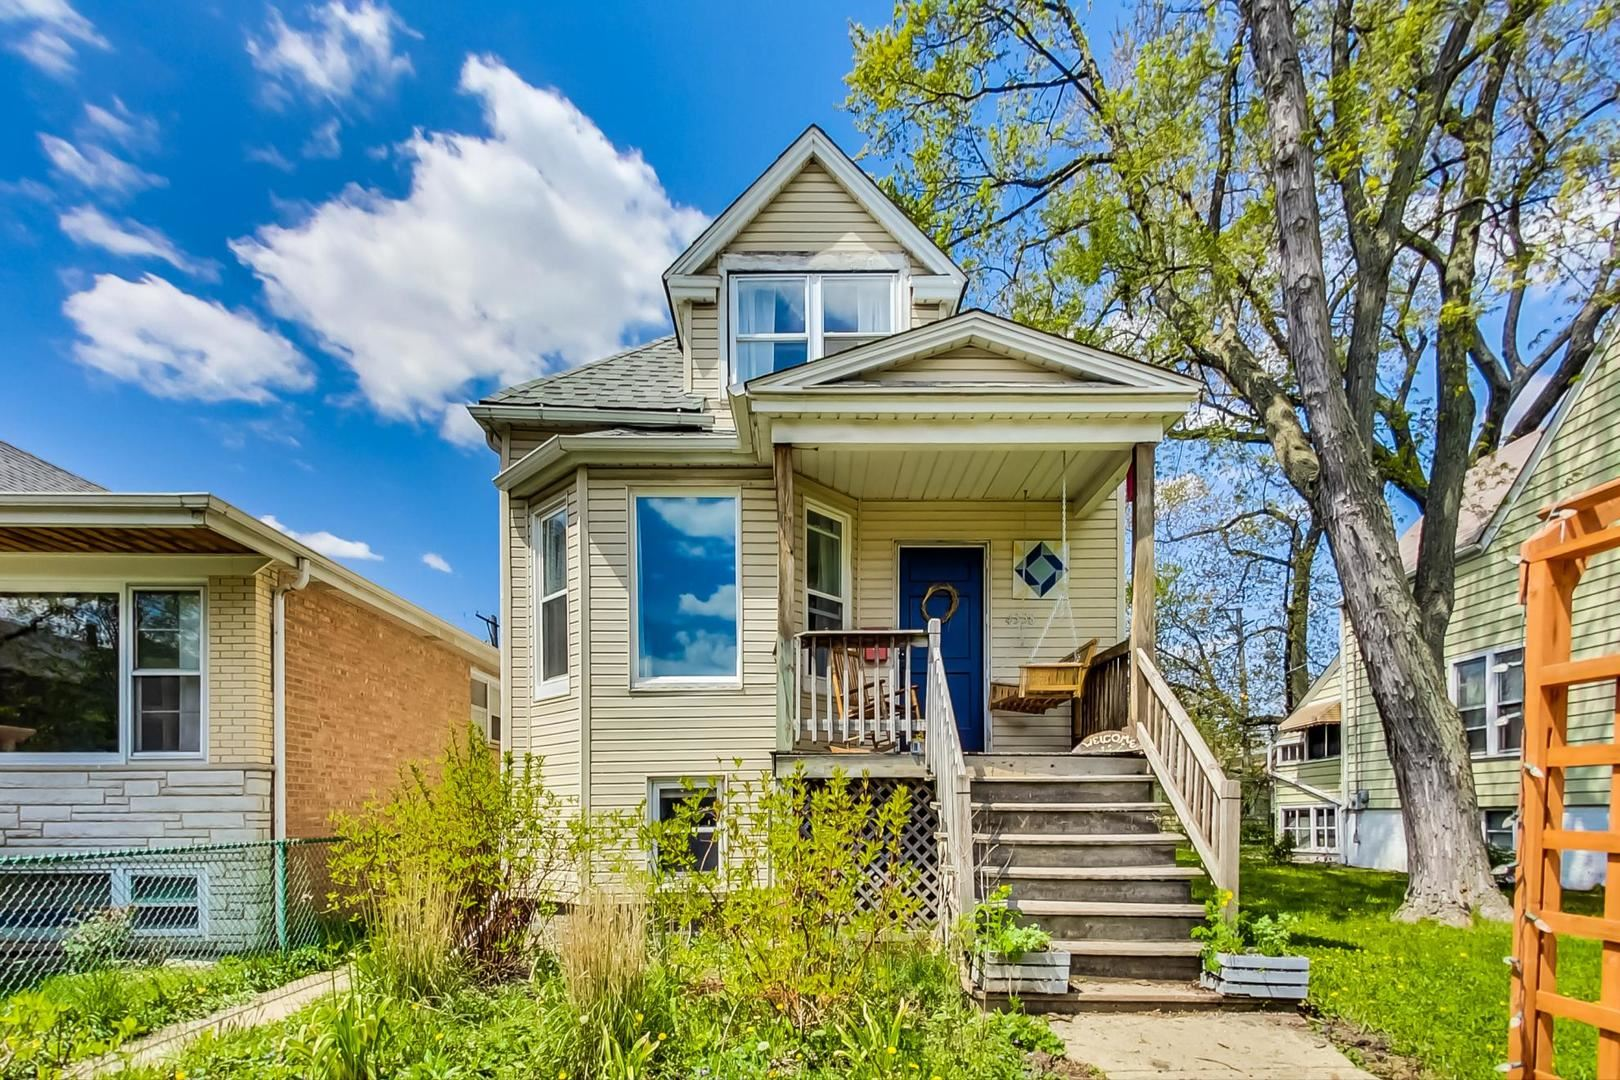 4338 N Avers Avenue, Chicago, IL 60618 - #: 10734305